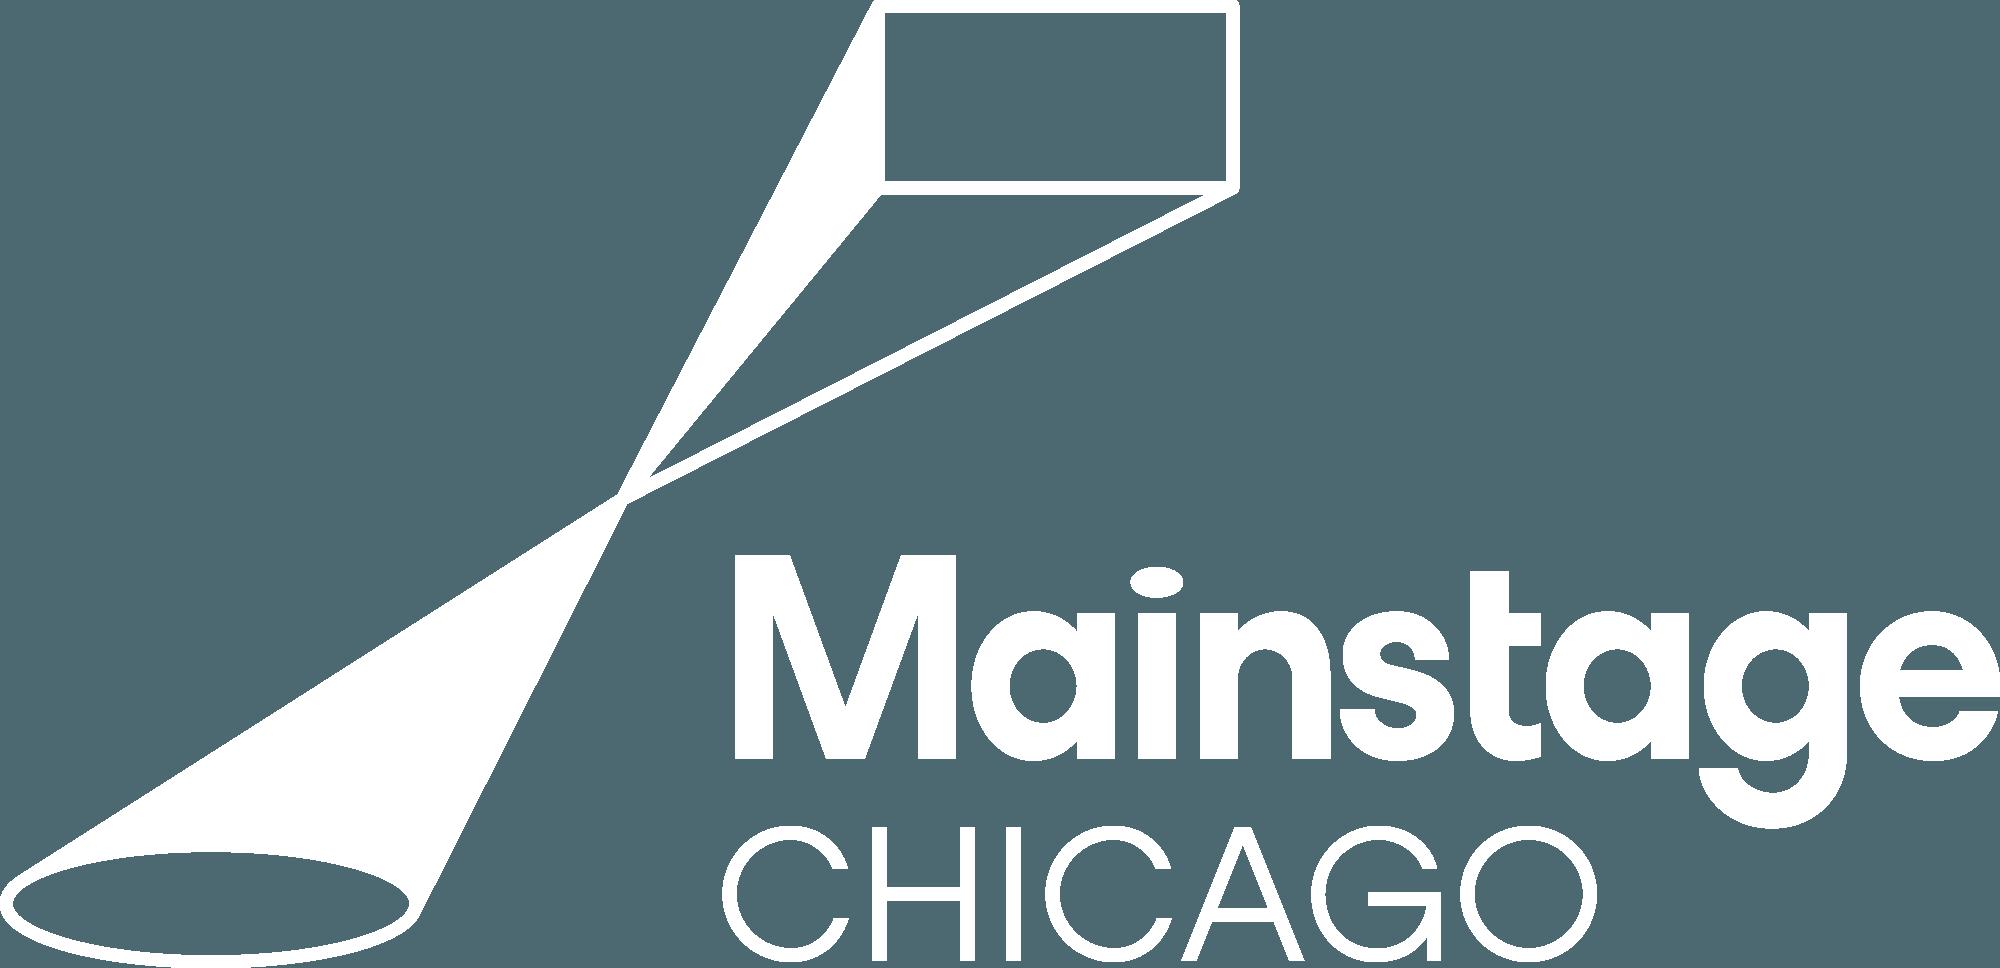 Mainstage Chicago